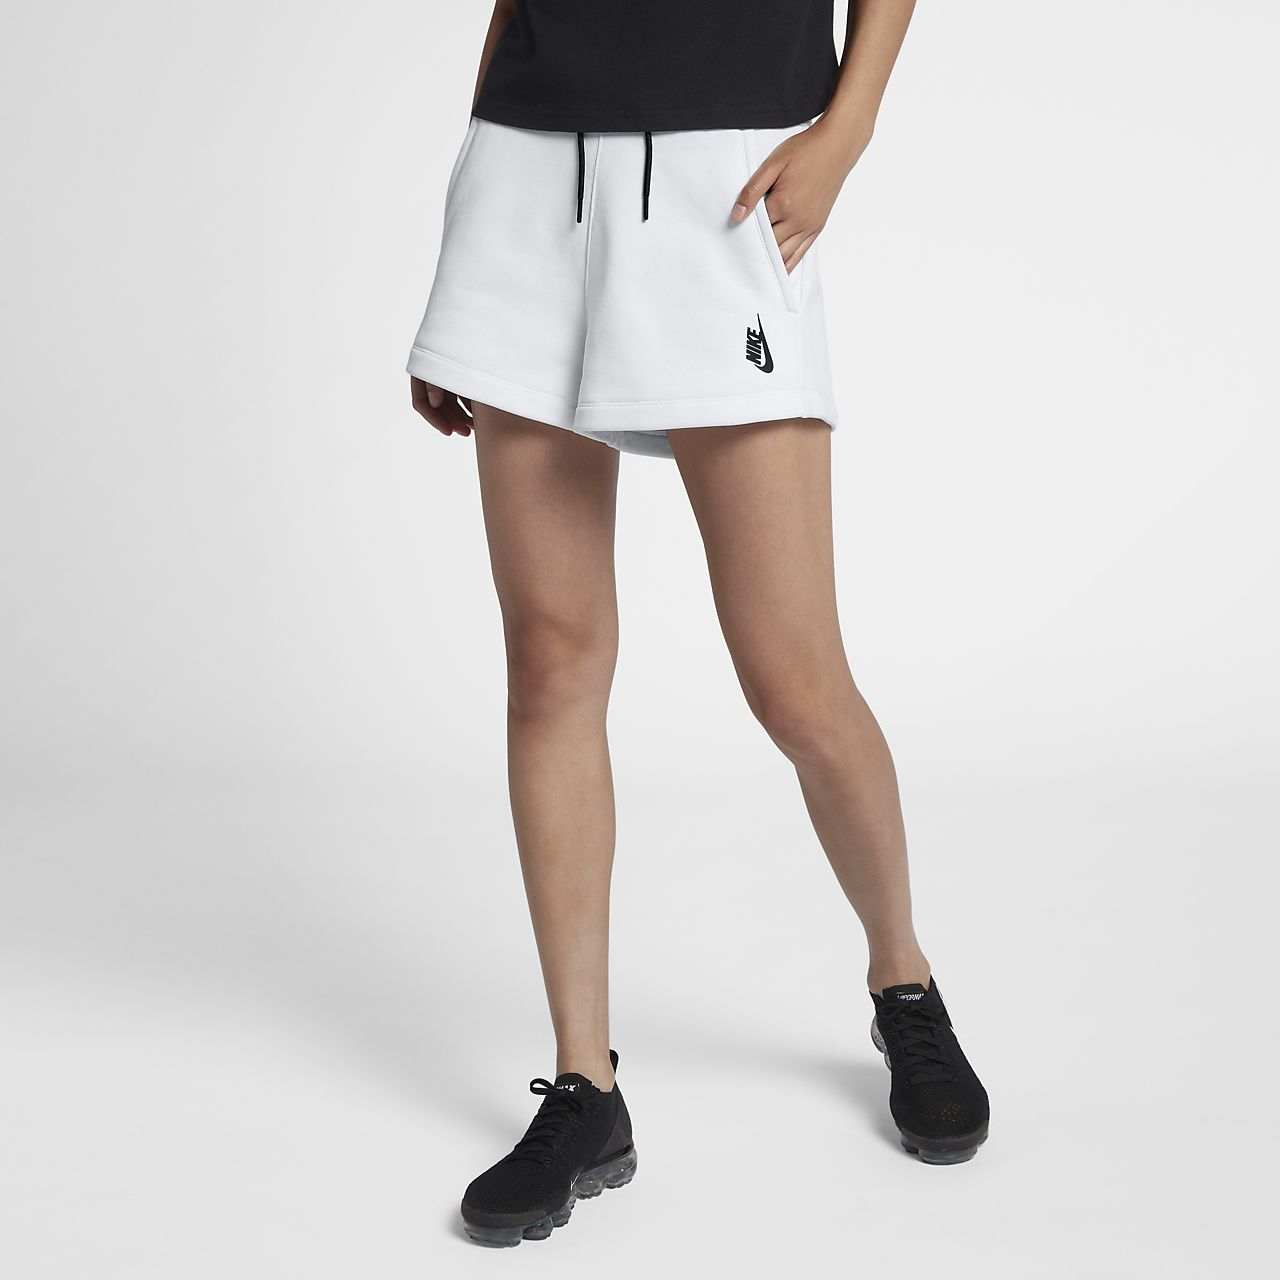 NikeLab Collection 女子针织短裤